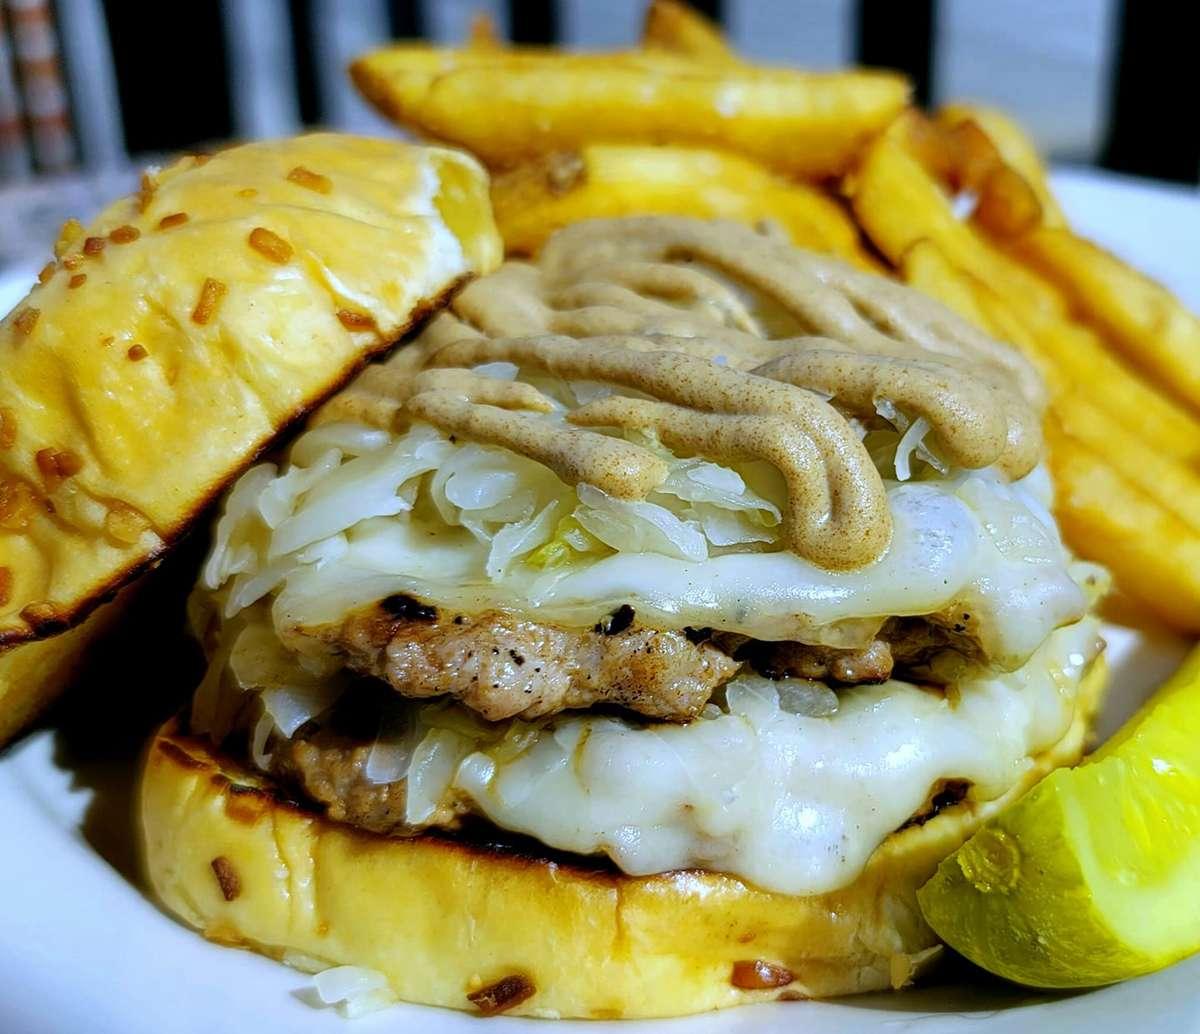 The Wurst Burger